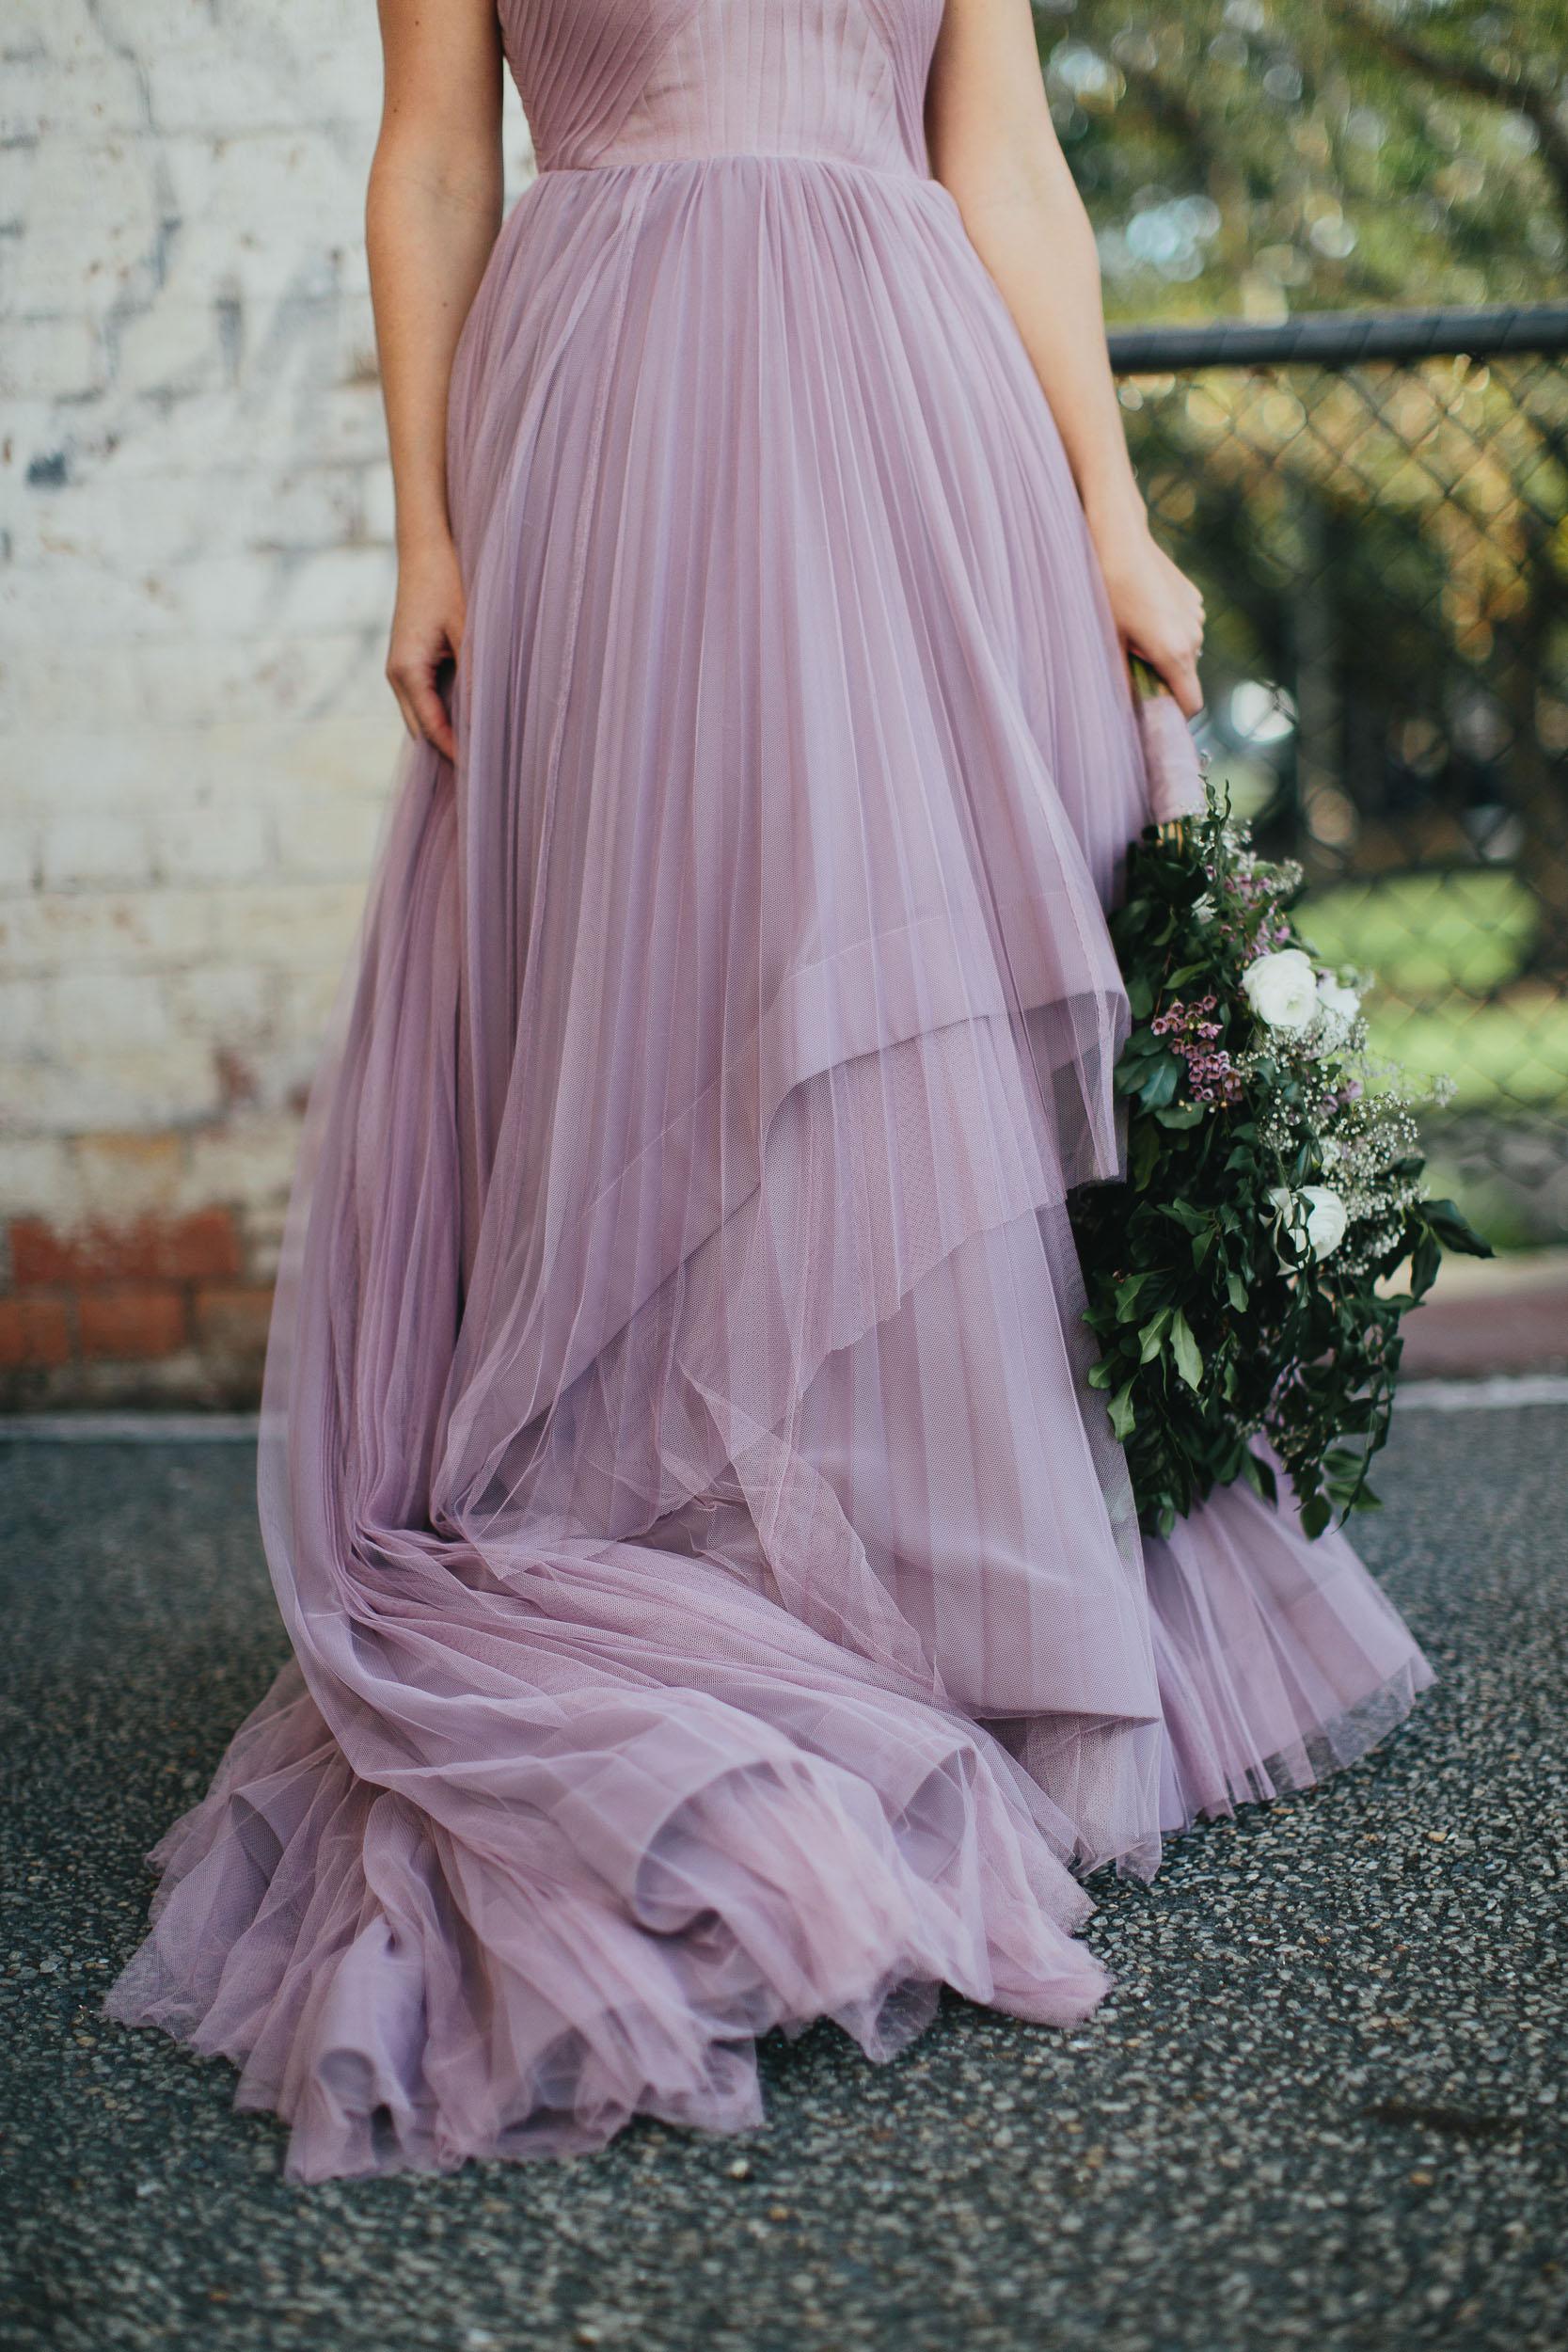 061_power_house_wedding_finch_and_oak.jpg